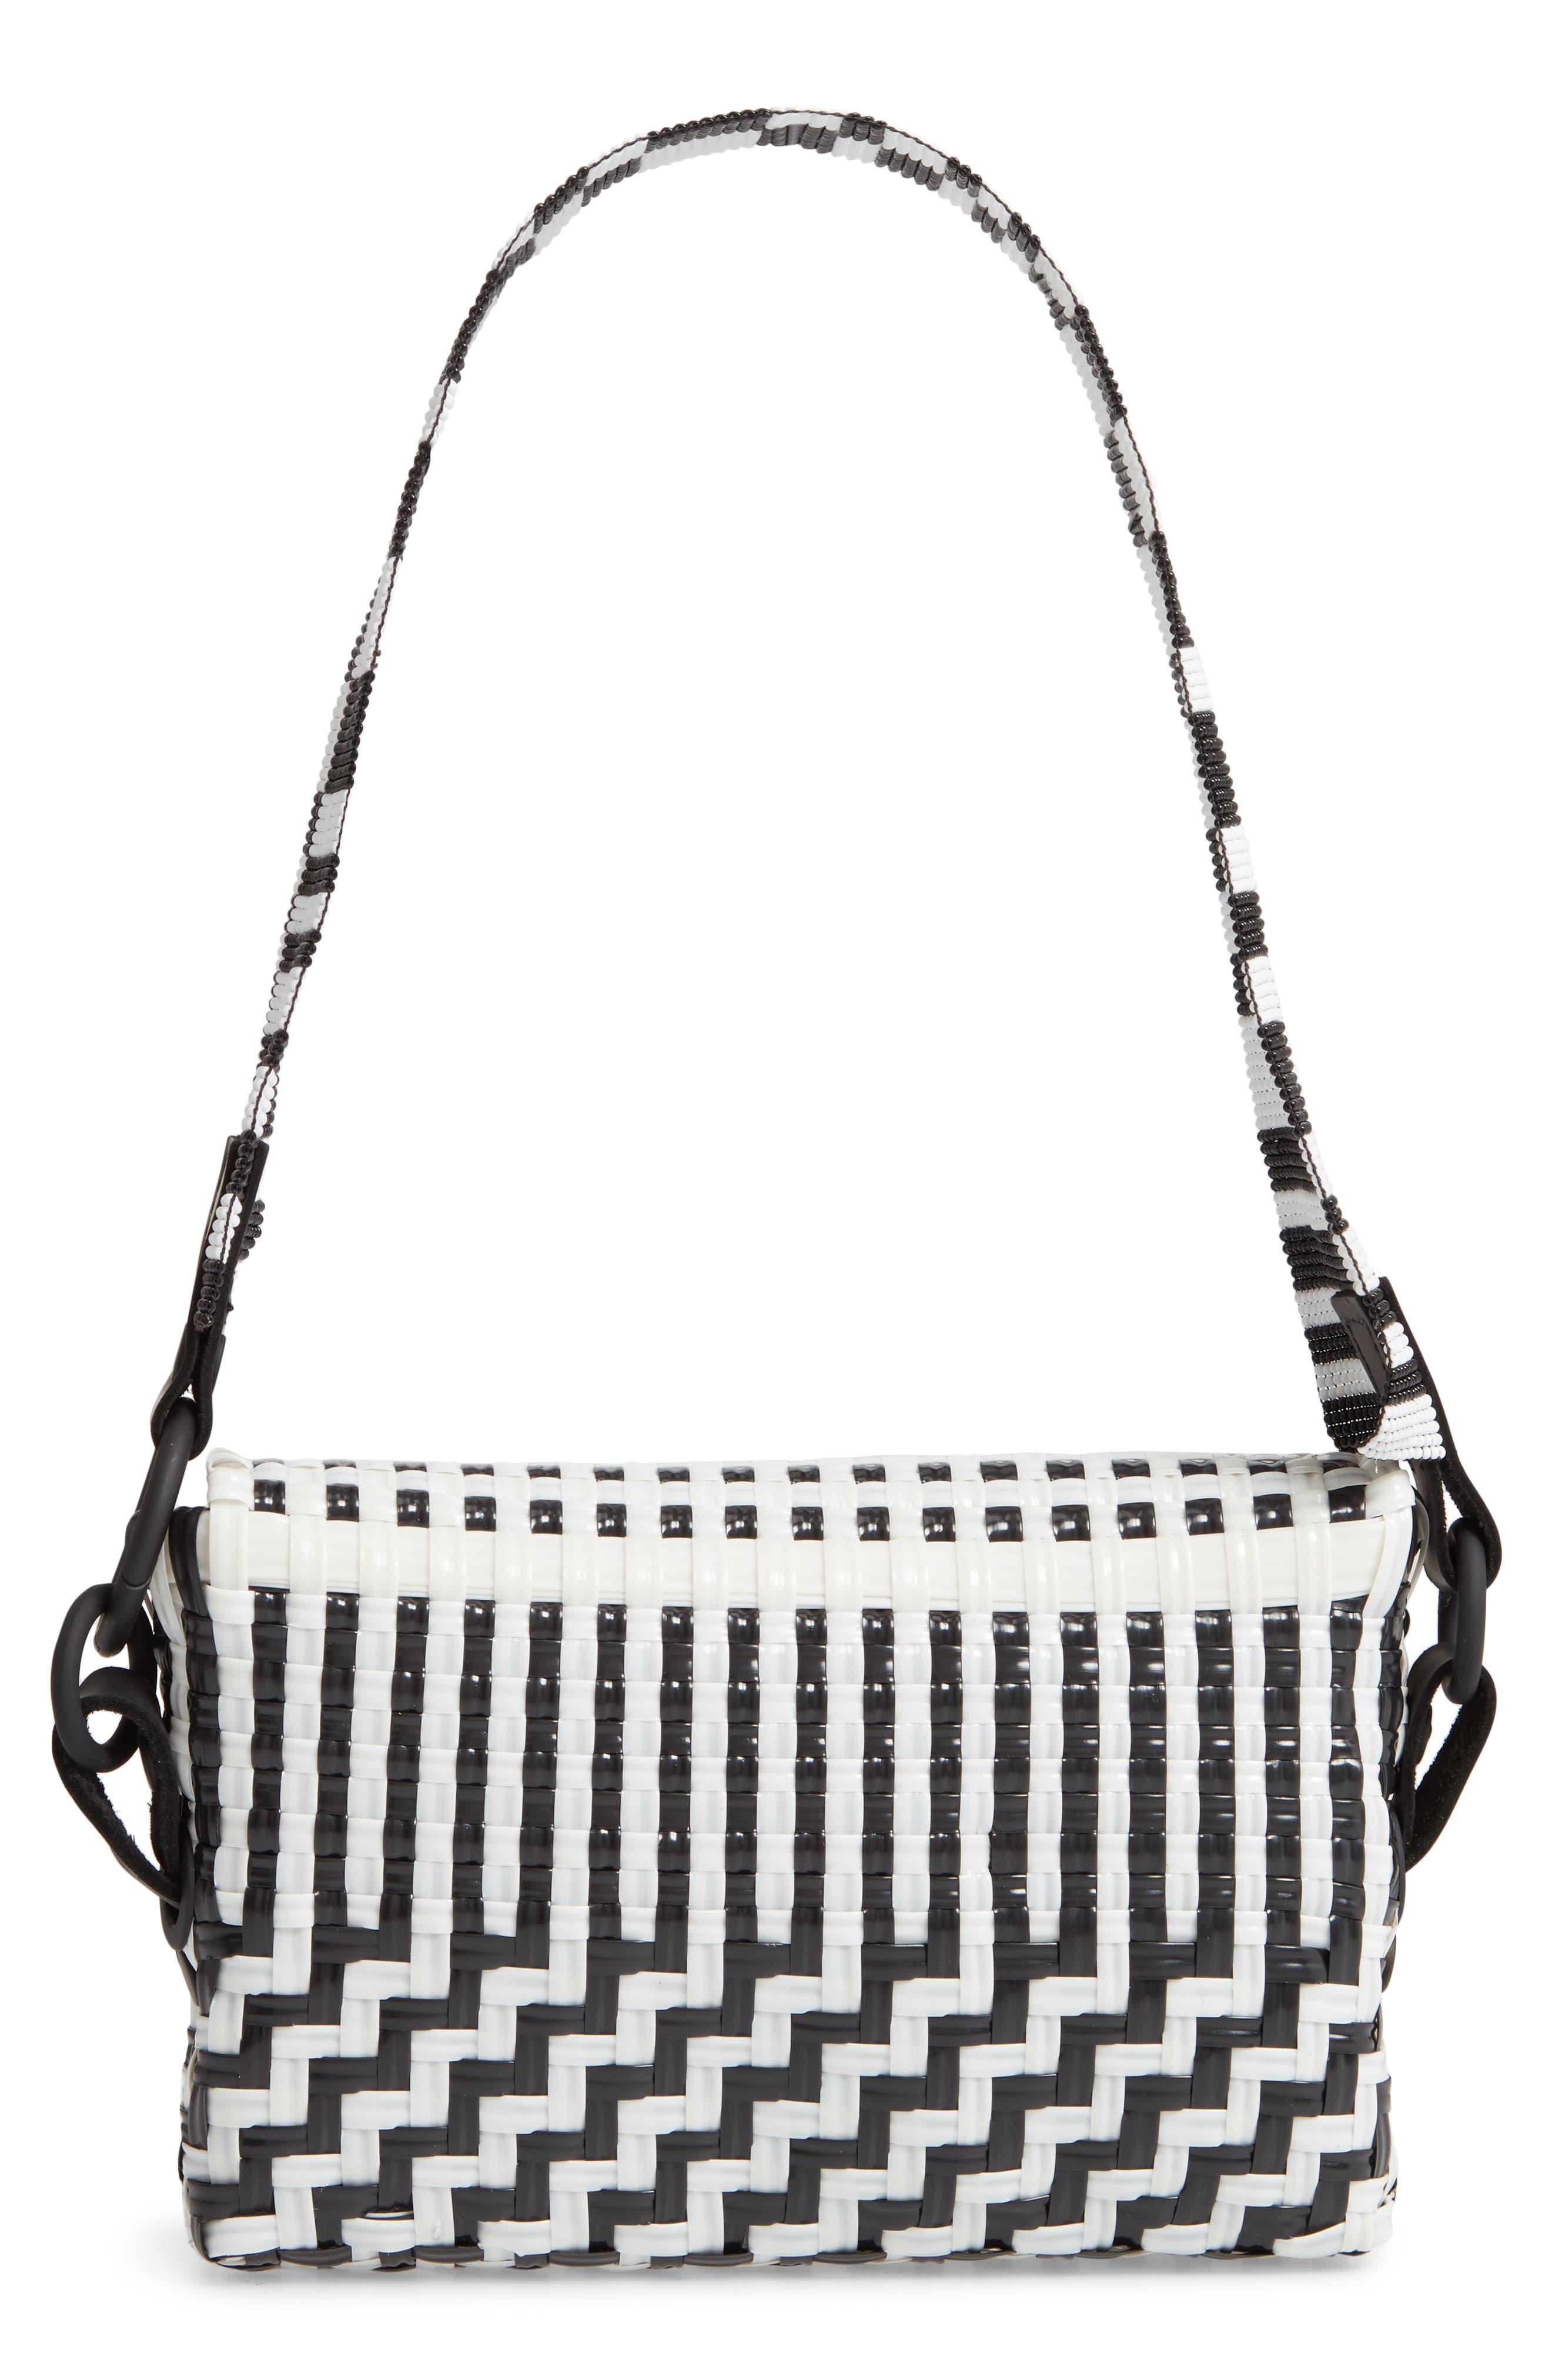 Woven Baguette Shoulder Bag,                             Alternate thumbnail 3, color,                             BLACK/ WHITE